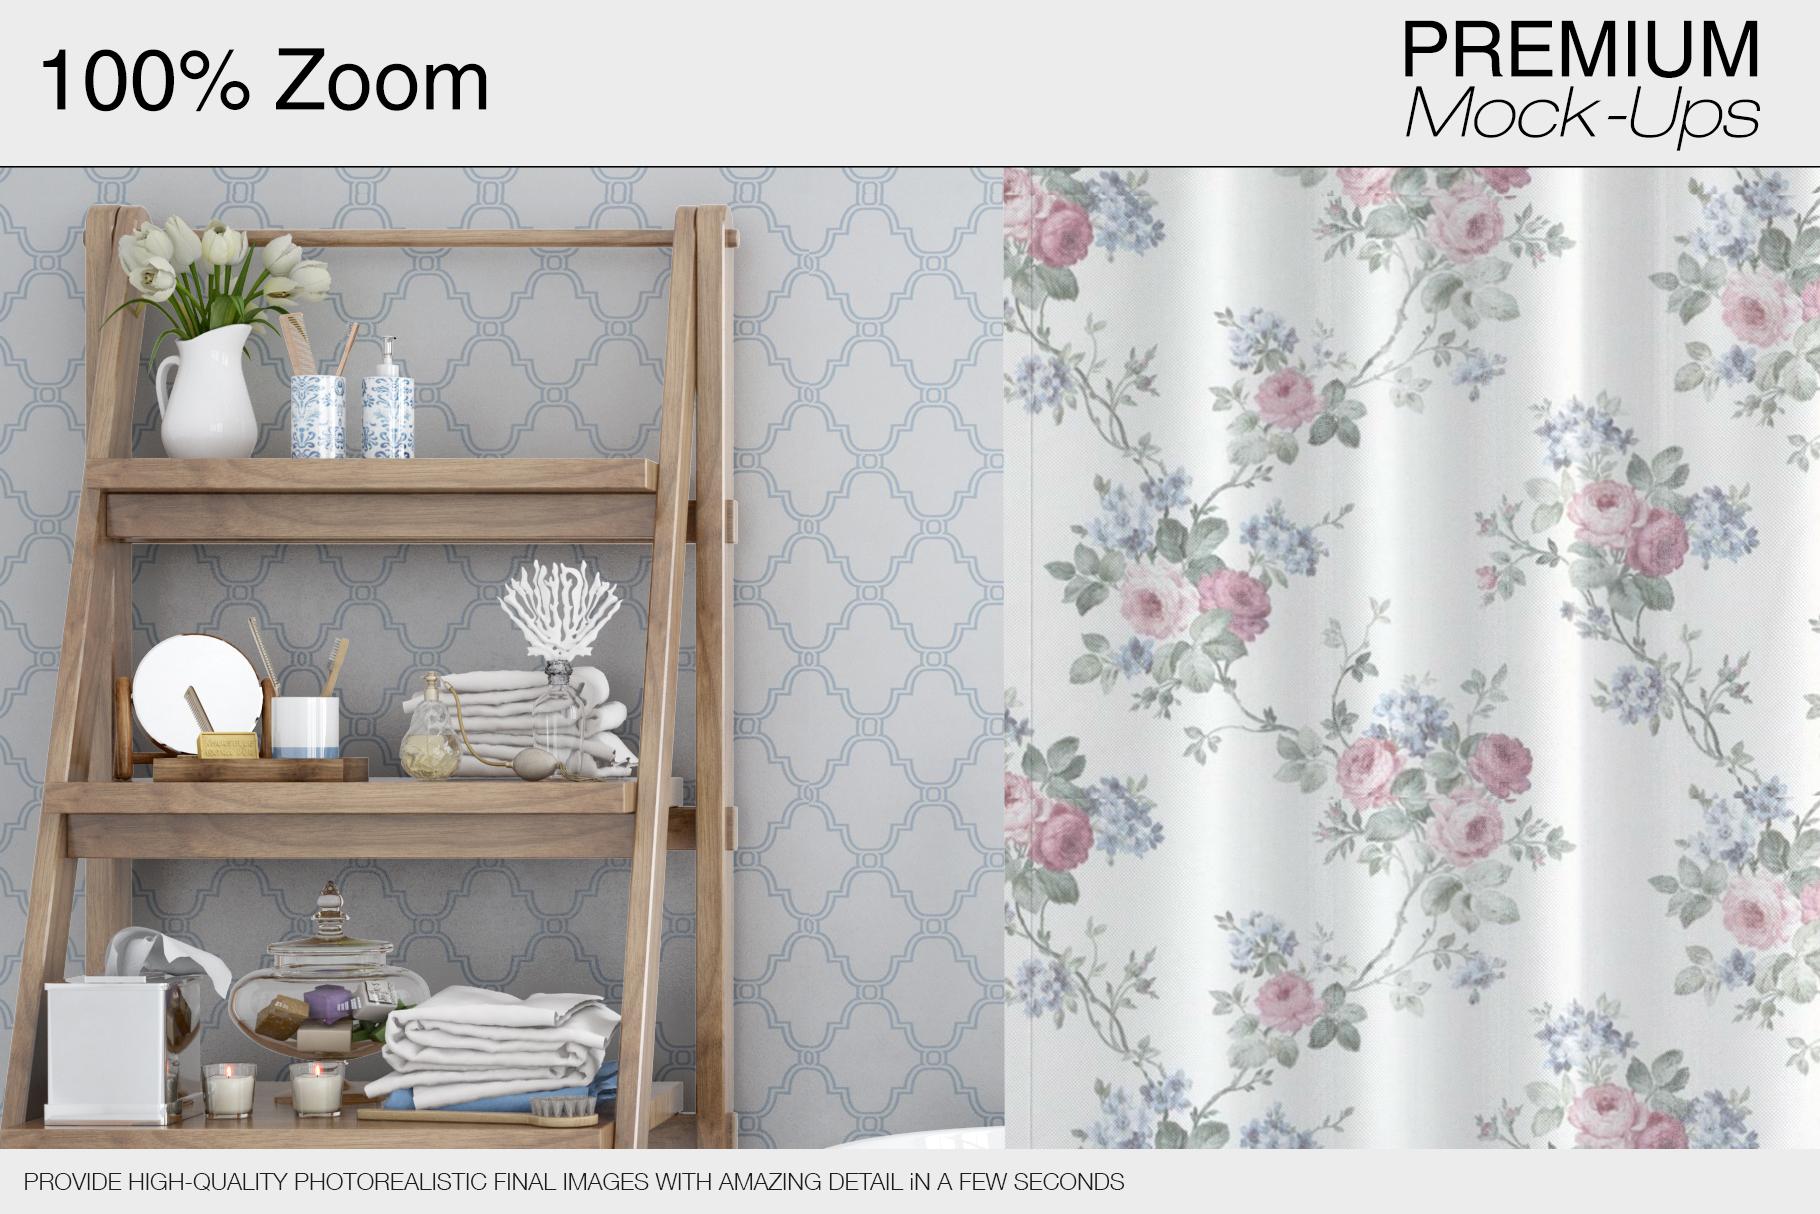 Bath Curtain Mockups example image 6